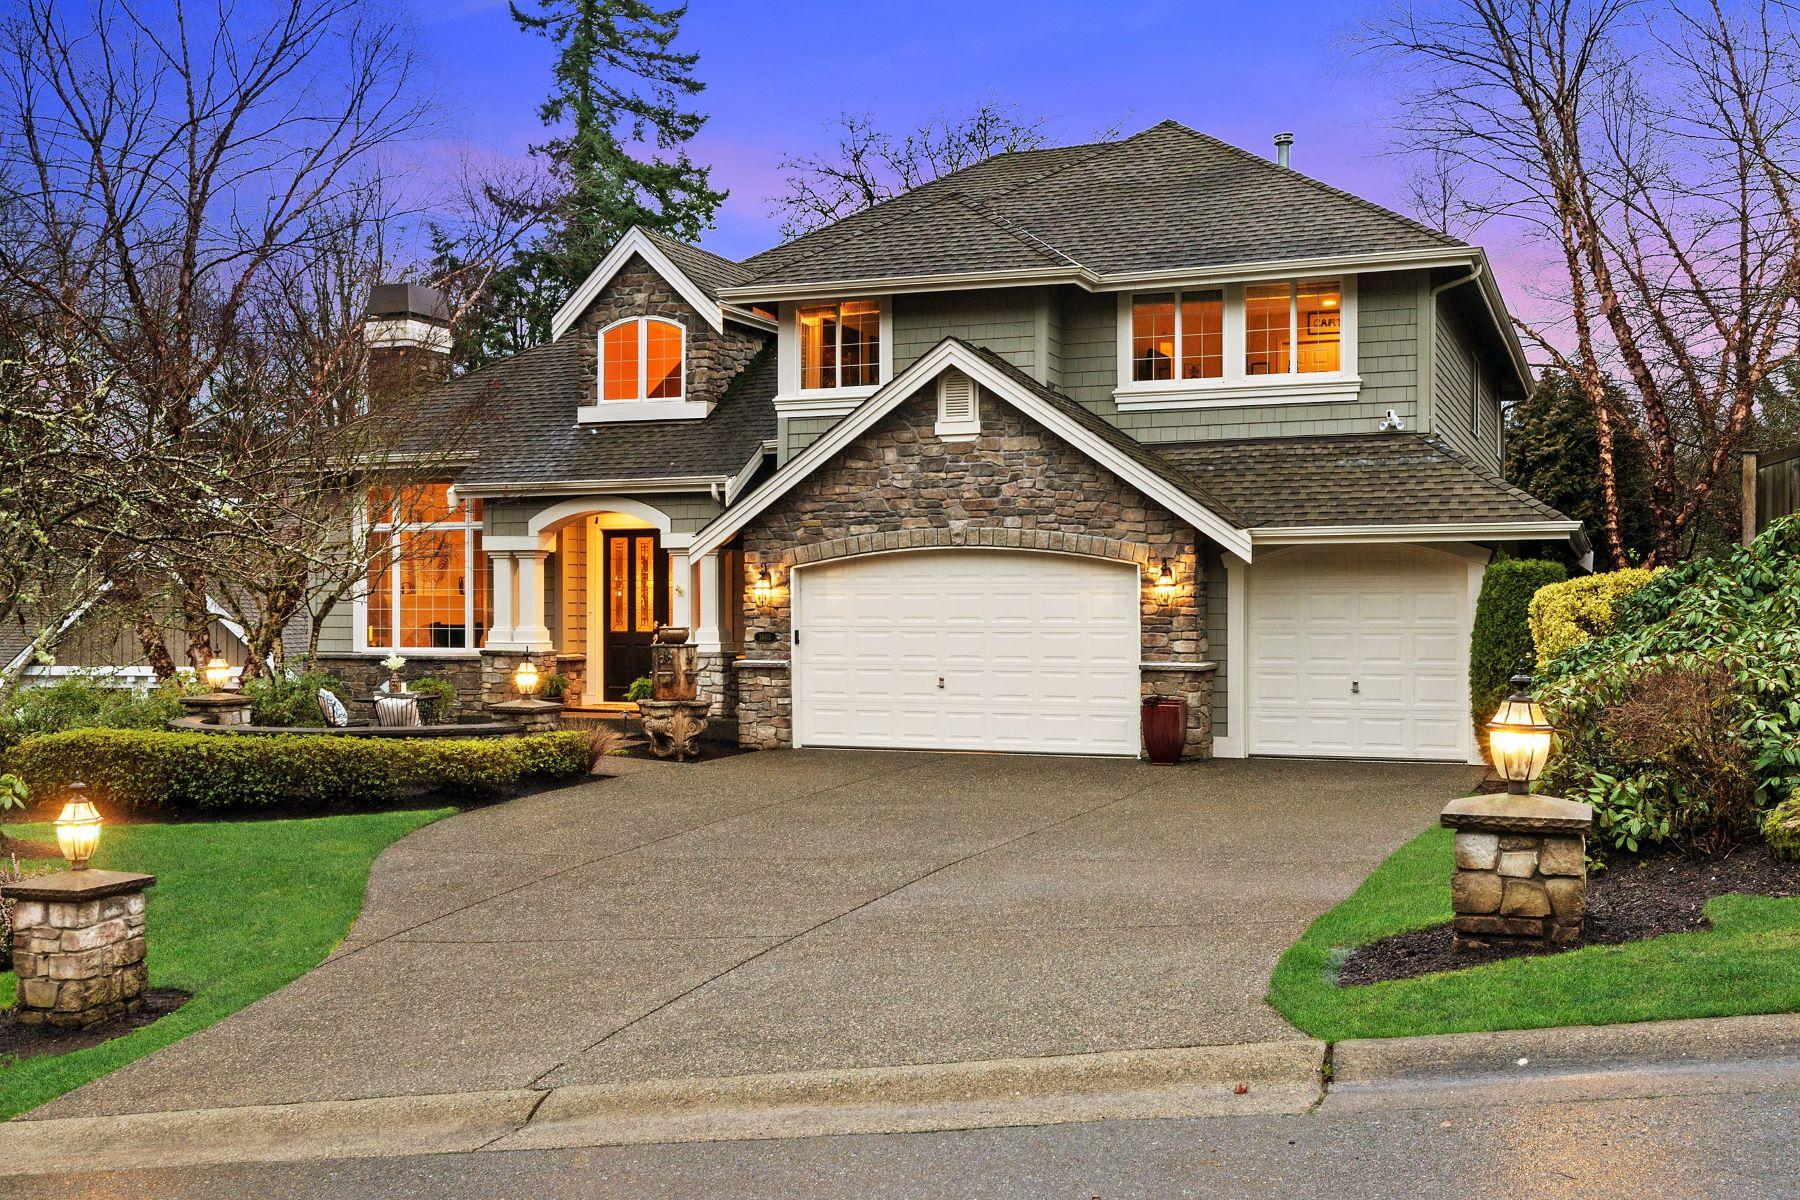 Single Family Homes for Sale at 14411 SE 89th Place, Newcastle, WA 98059 14411 SE 89th Place Newcastle, Washington 98059 United States